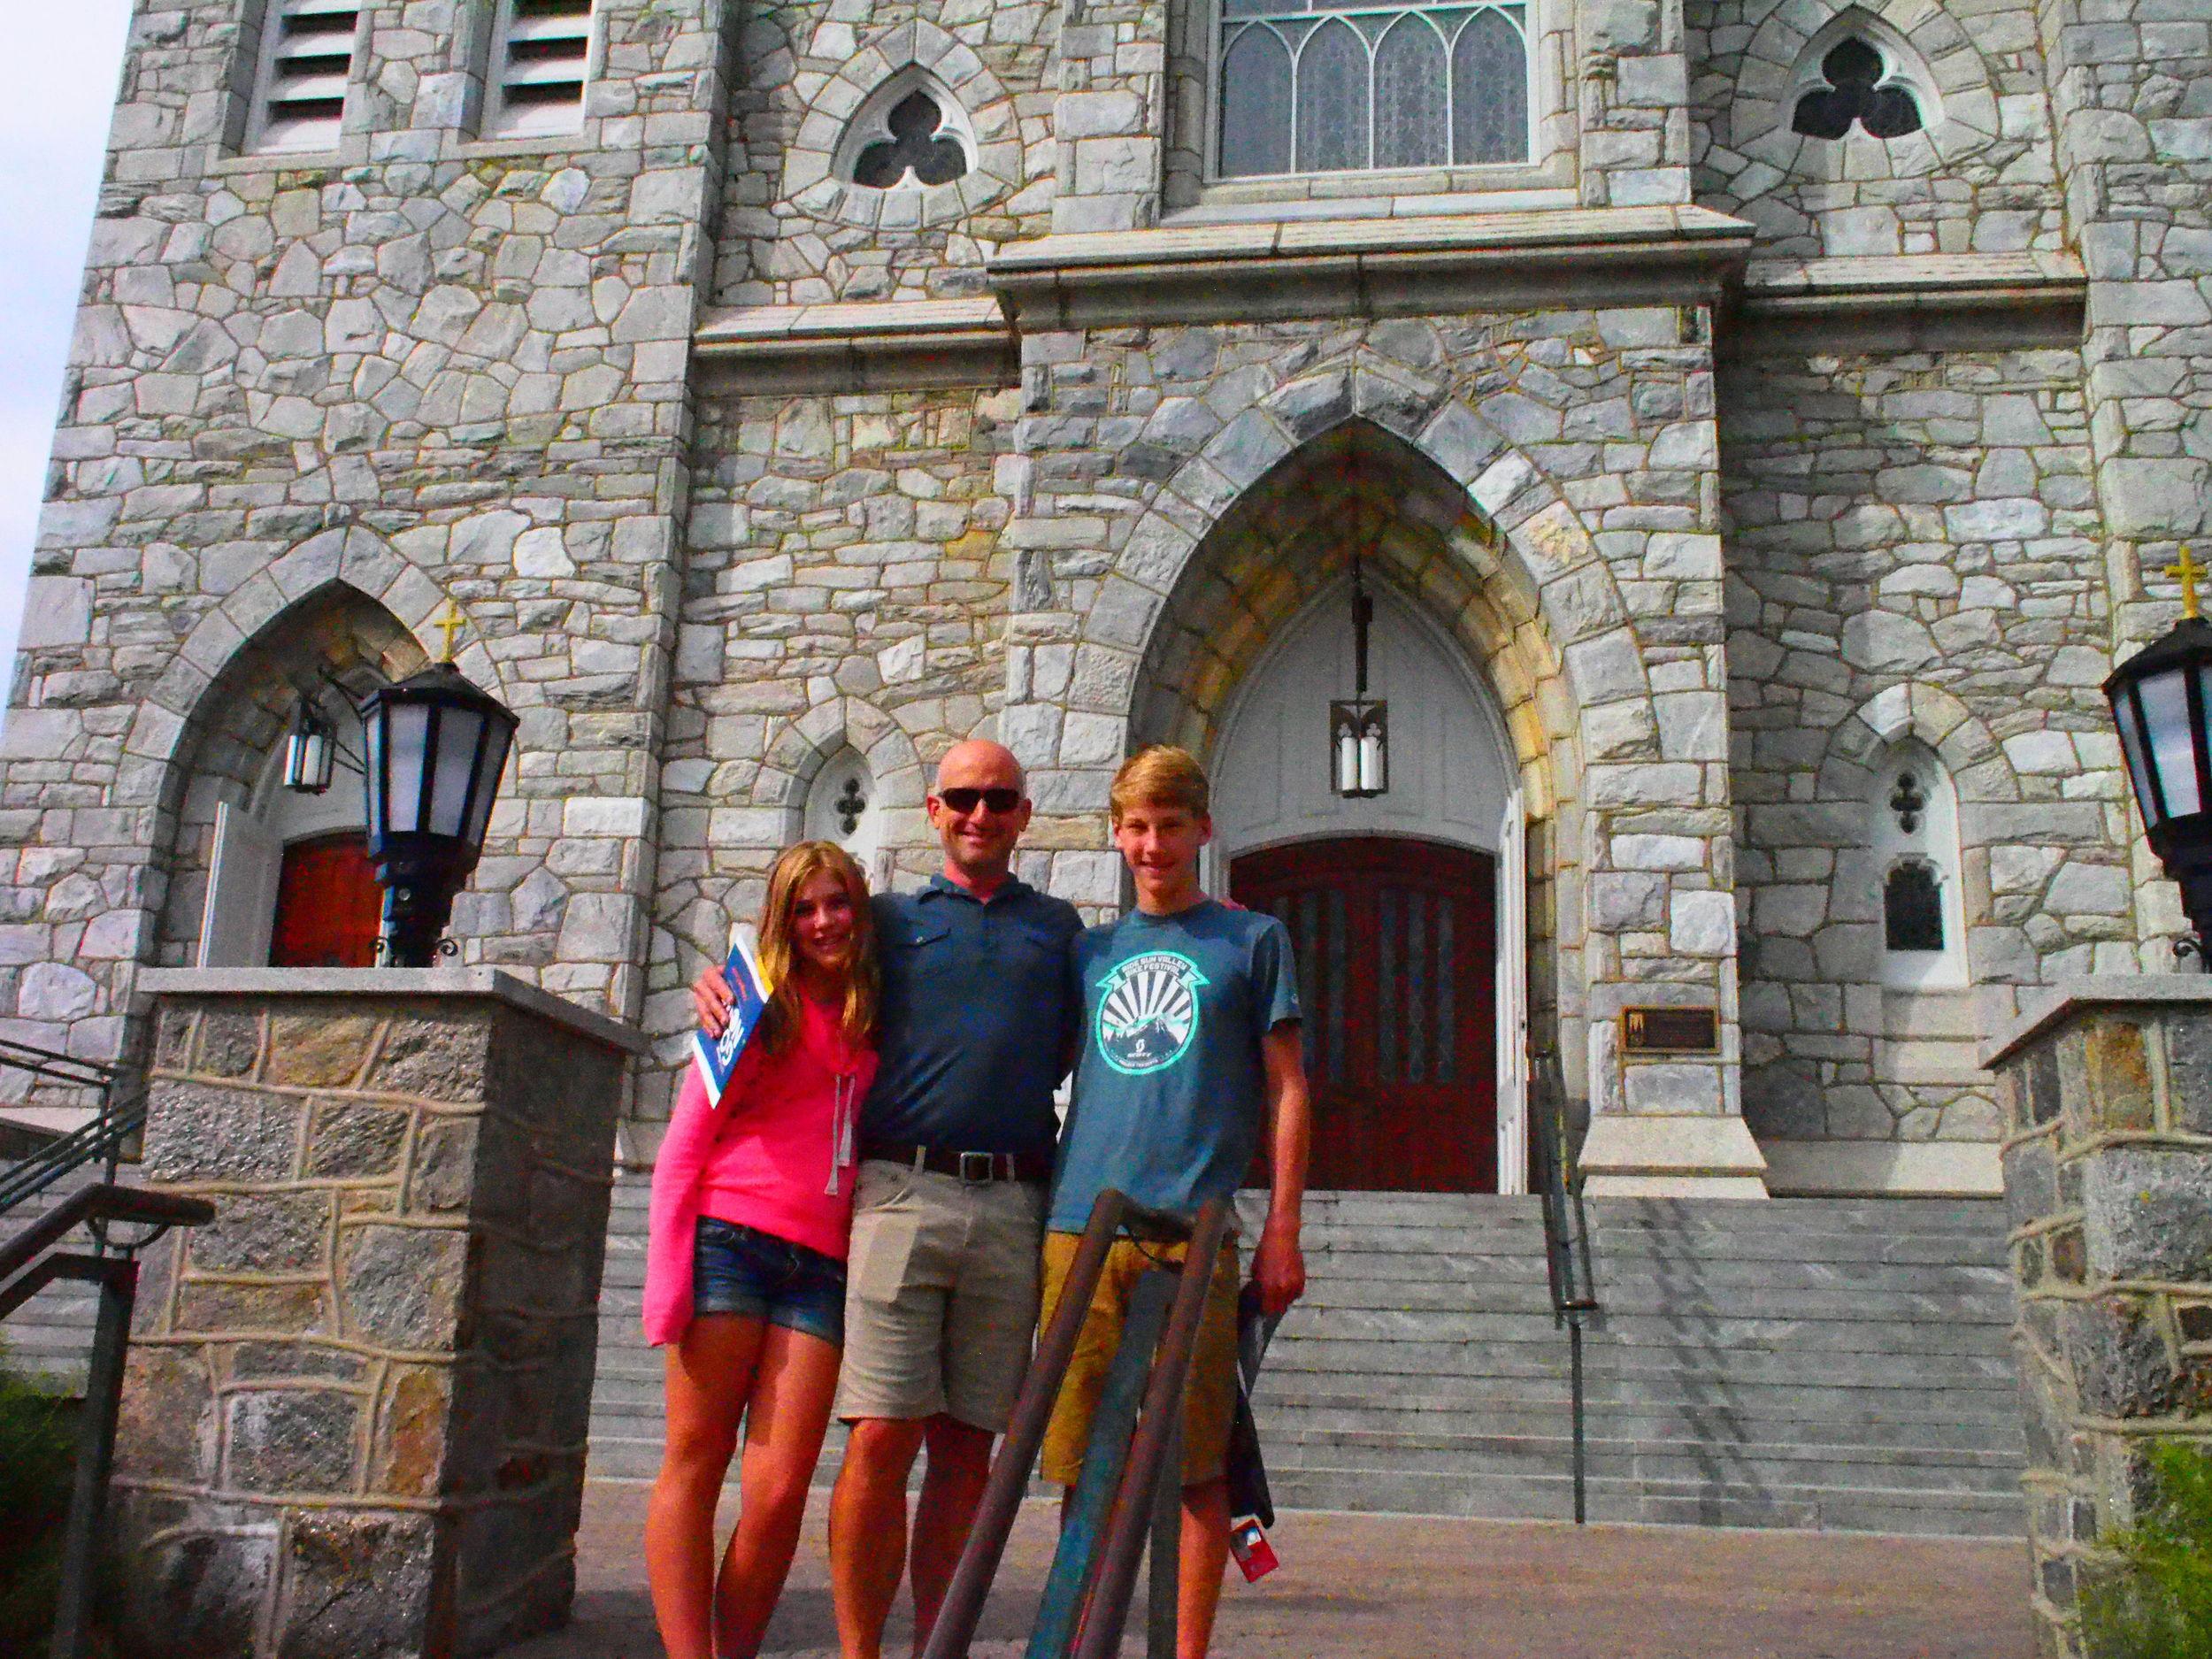 Our visit to Villanova